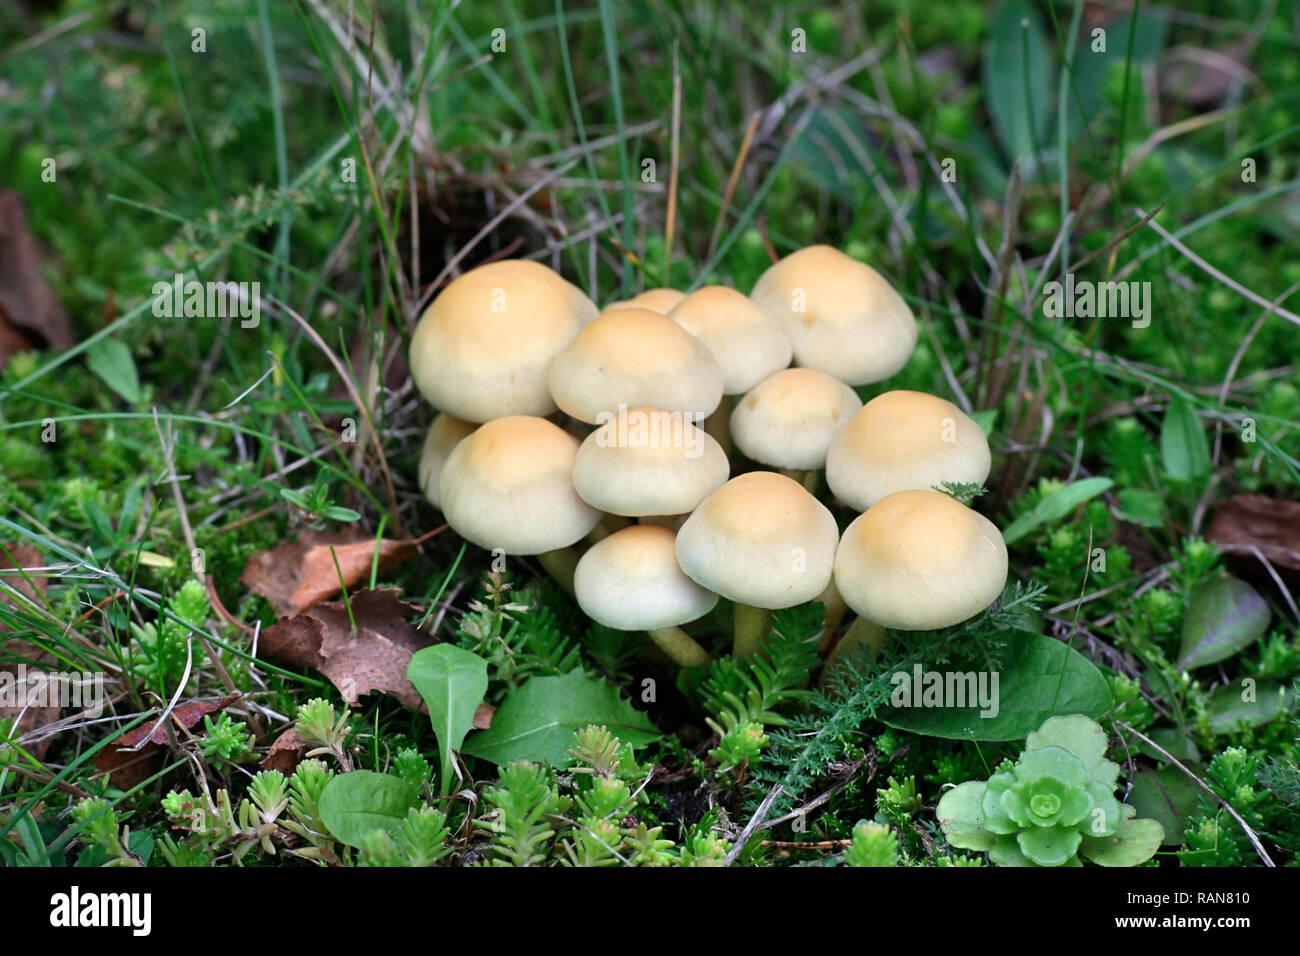 Conifer tuft mushroom, Hypholoma capnoides, an edible wild mushroom from Finland - Stock Image